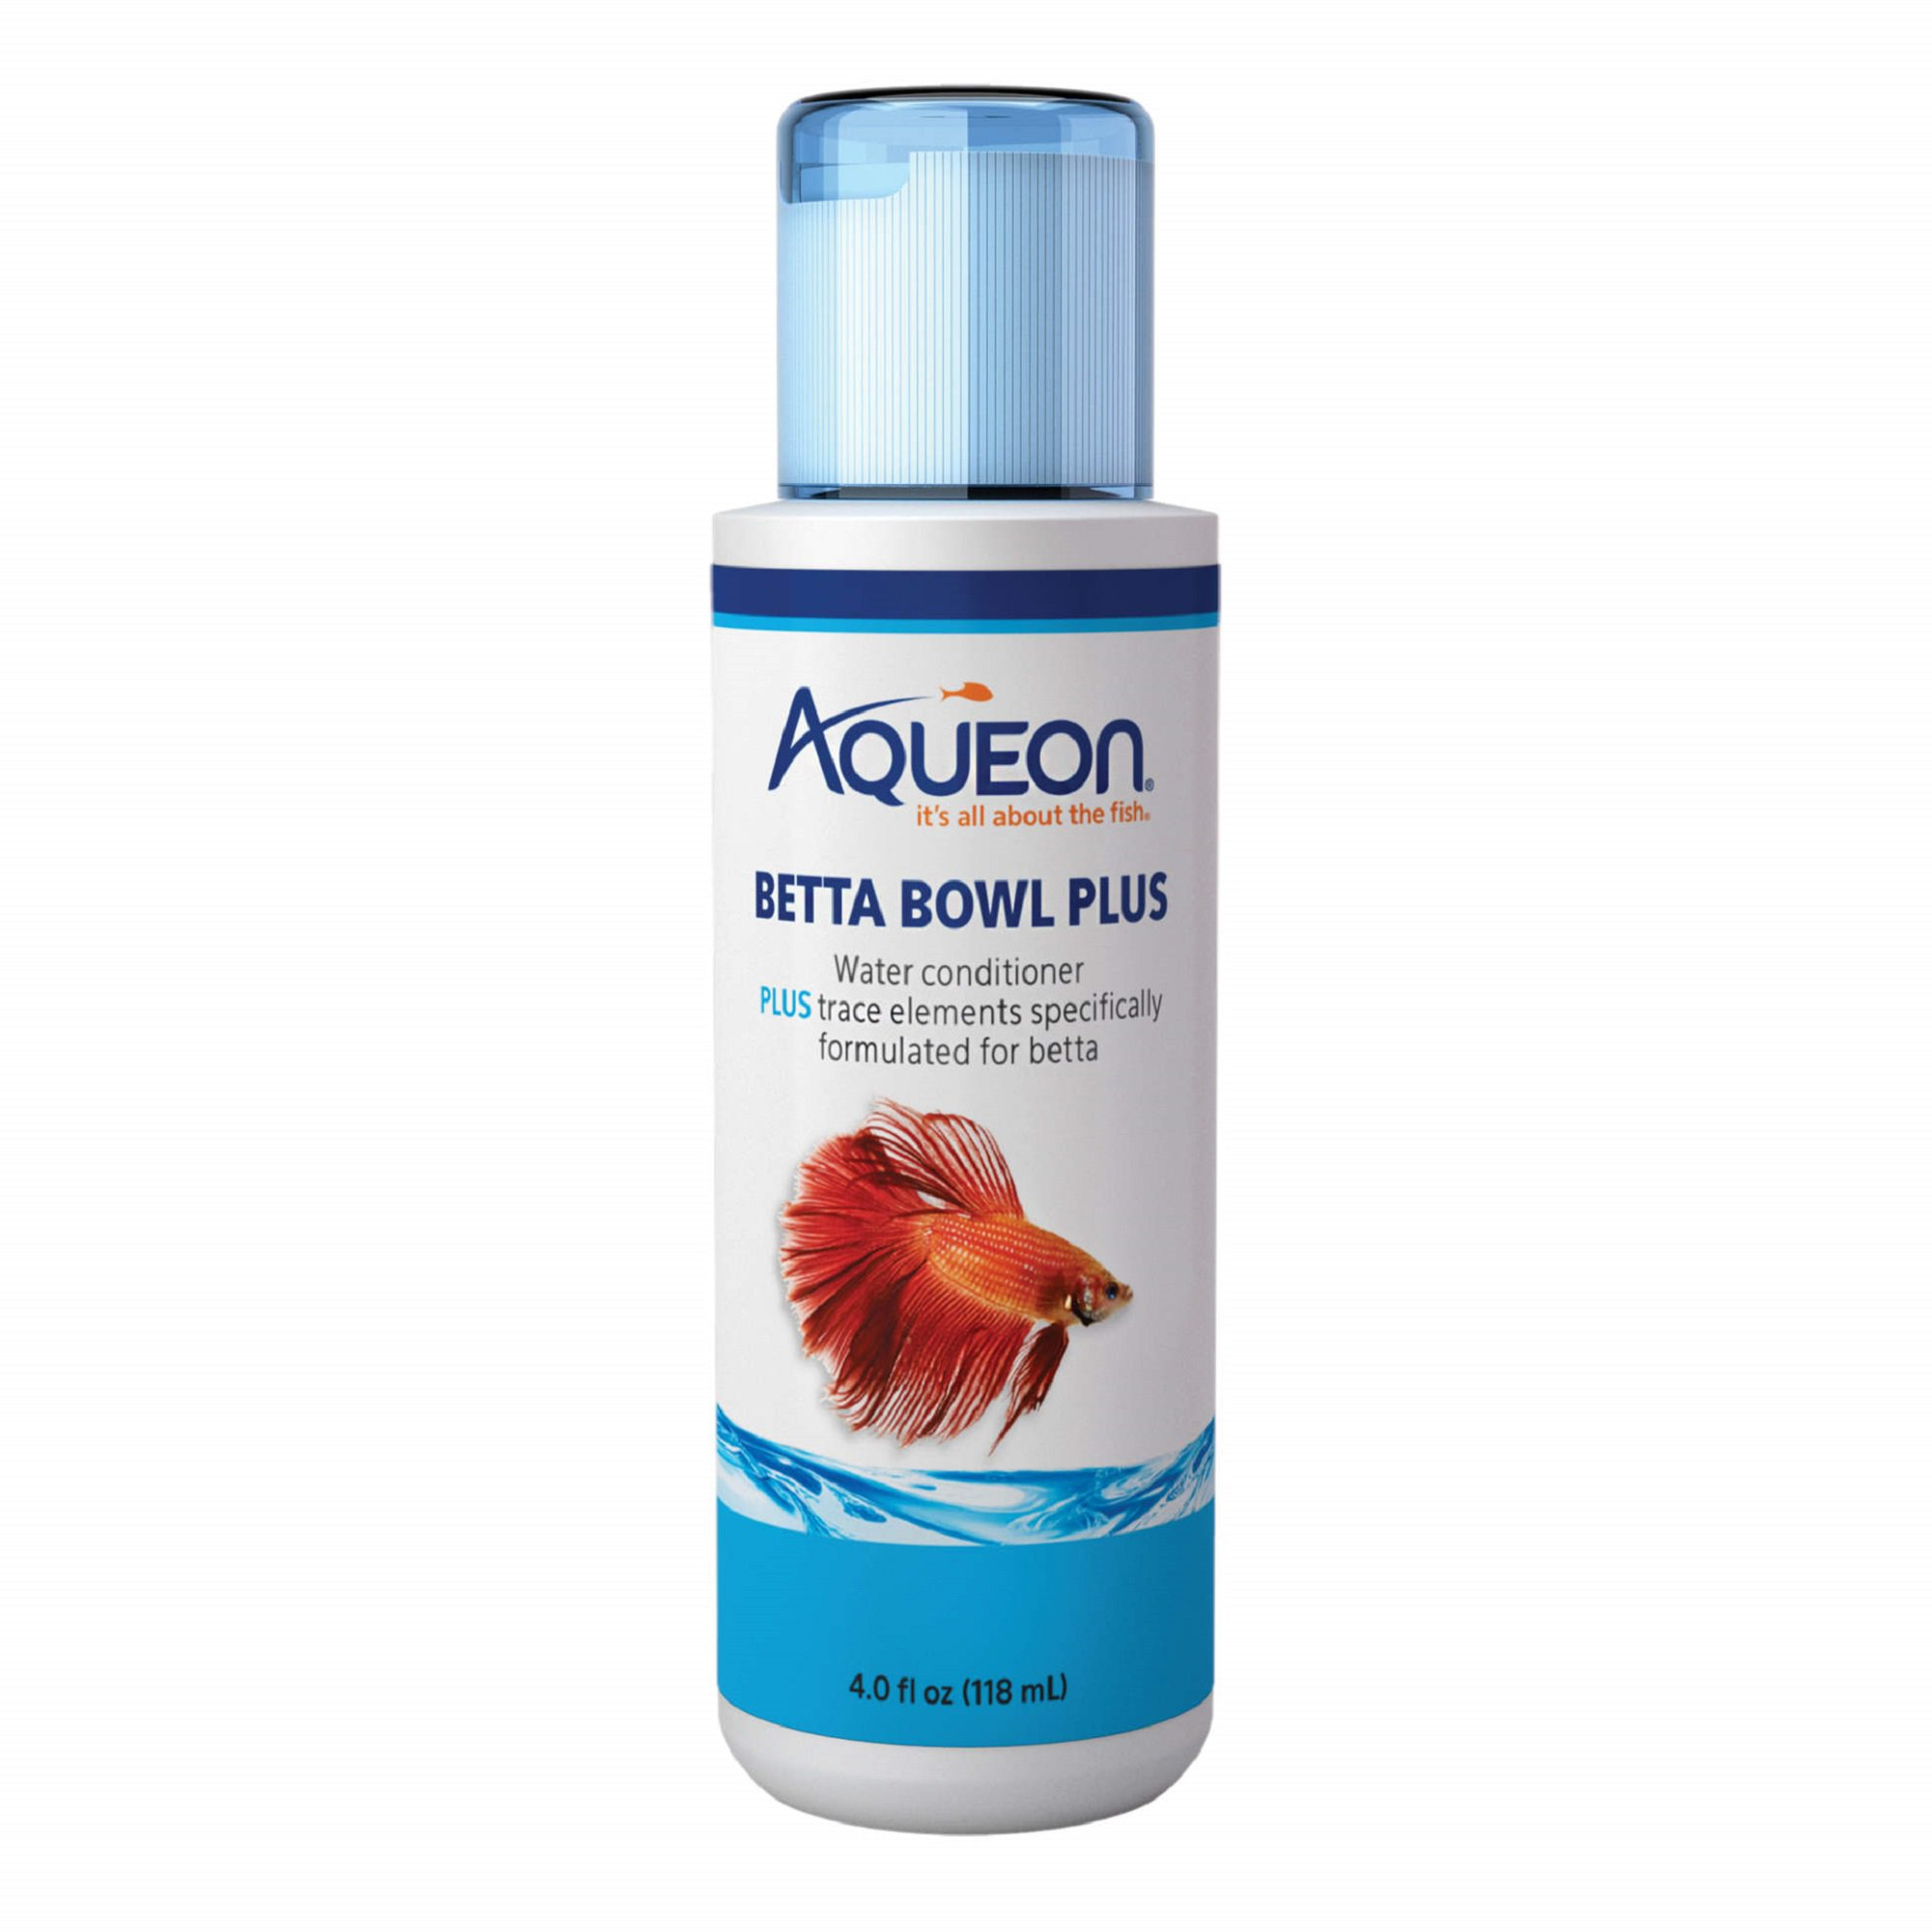 Aqueon betta bowl plus water conditioner dechlorinator for Dechlorinator for fish